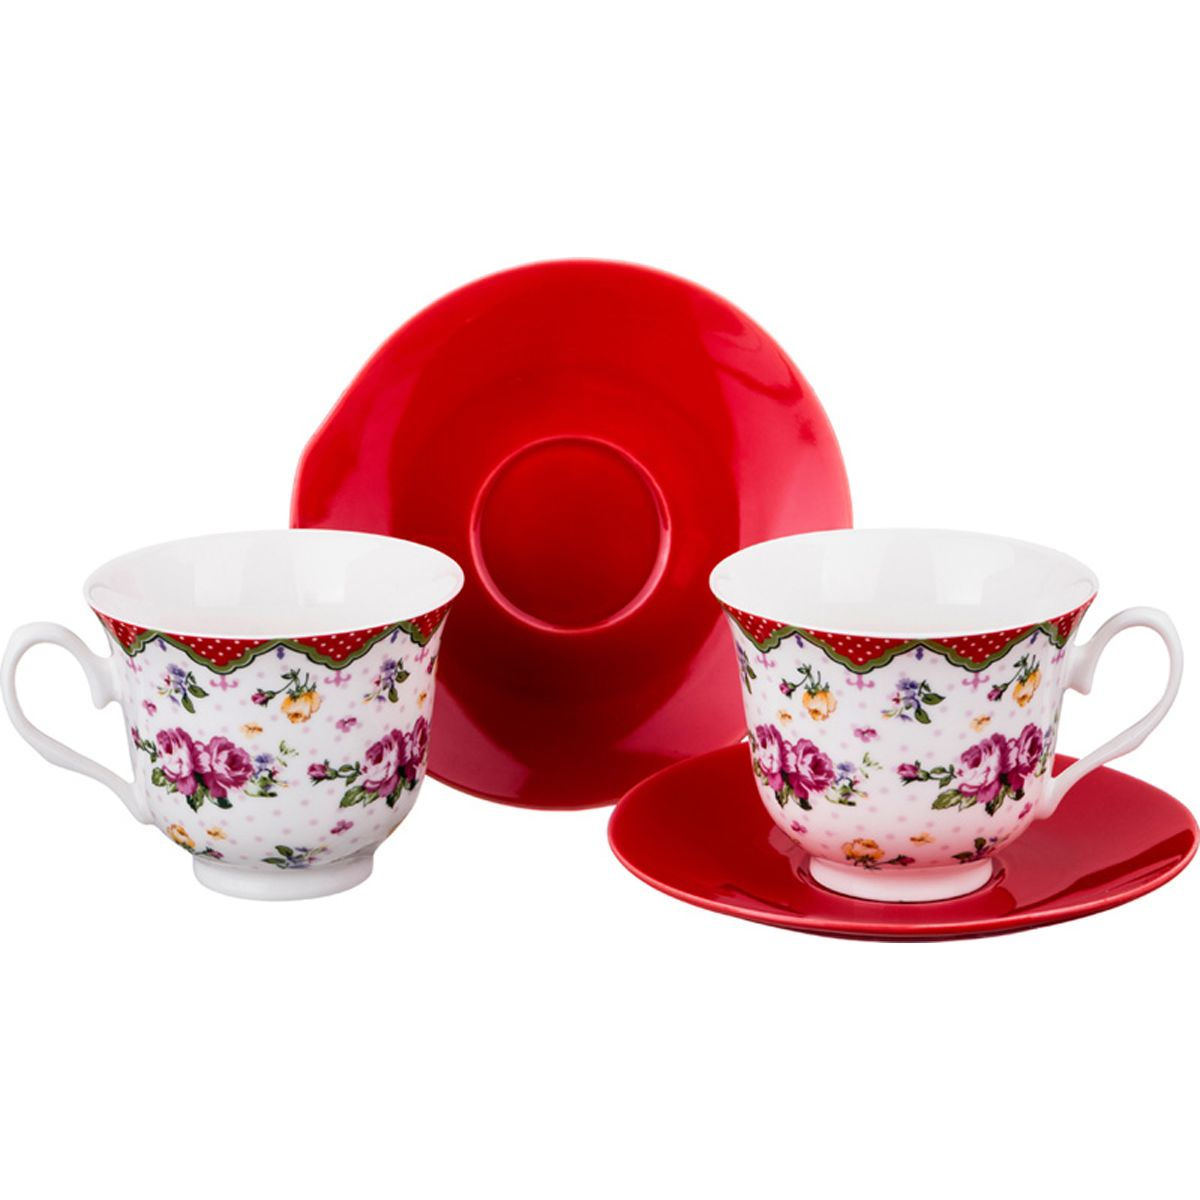 Чайный набор на 2 персоны Lefard Яркий сад, белый, красный, 220 мл набор чайный на 2 персоны c622as622a l6 yg01 2 розовый 4 предмета